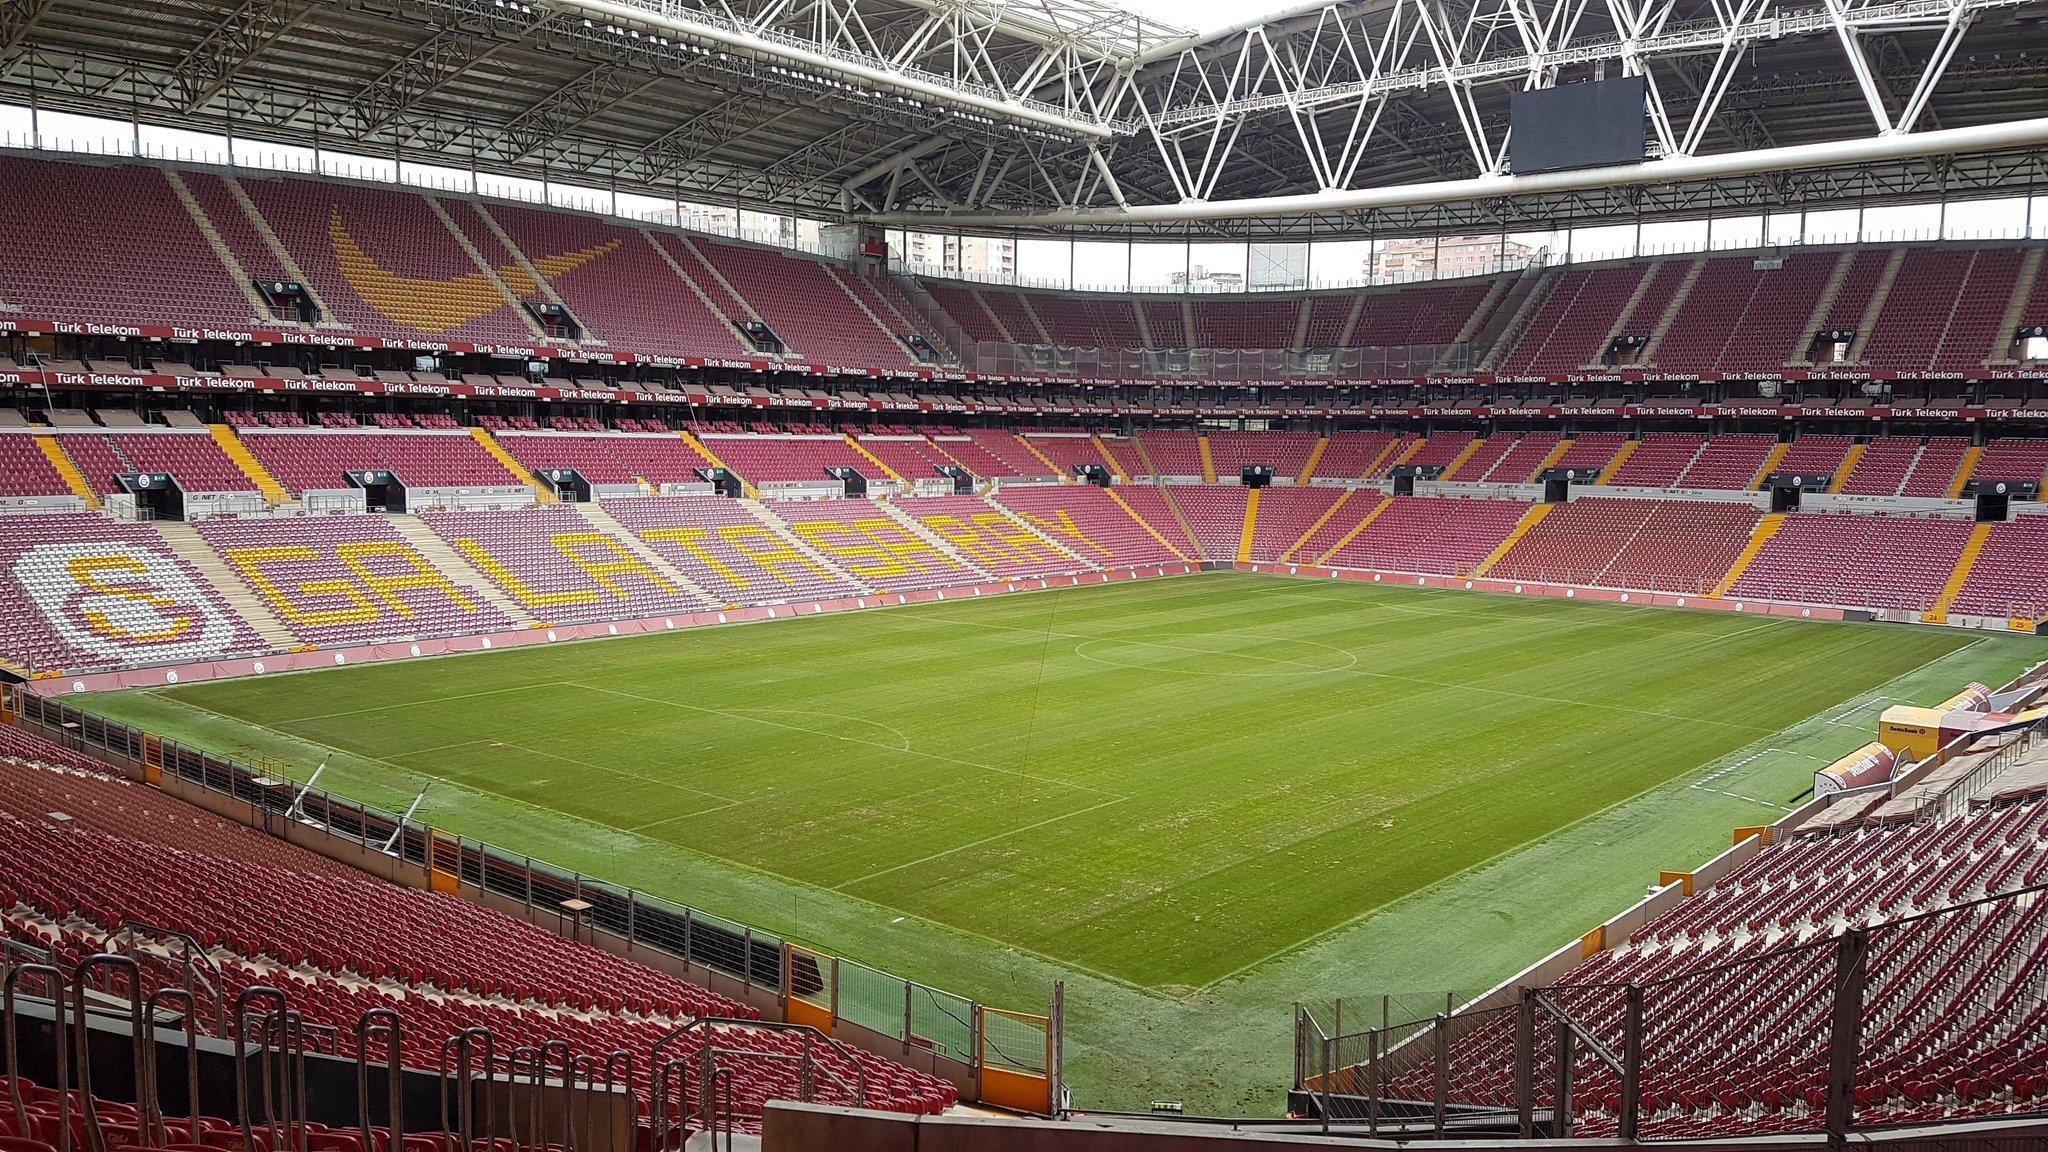 Galatasaray_Arena_North-West_Corner.jpg